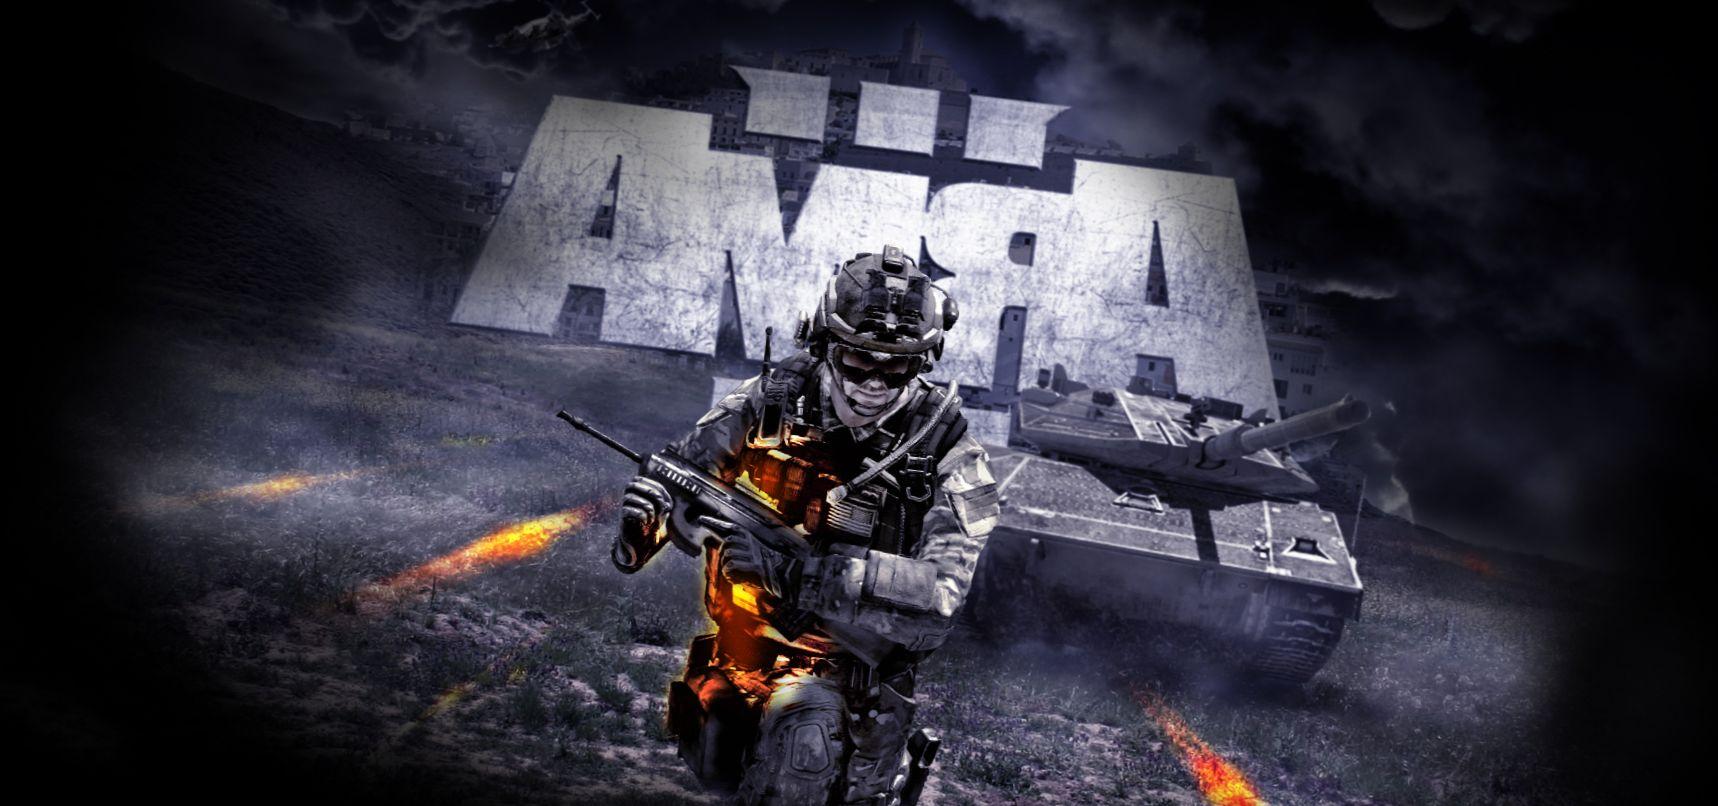 Arma III ha vendido mas de 3 Millones de Copias-frikigamers.com